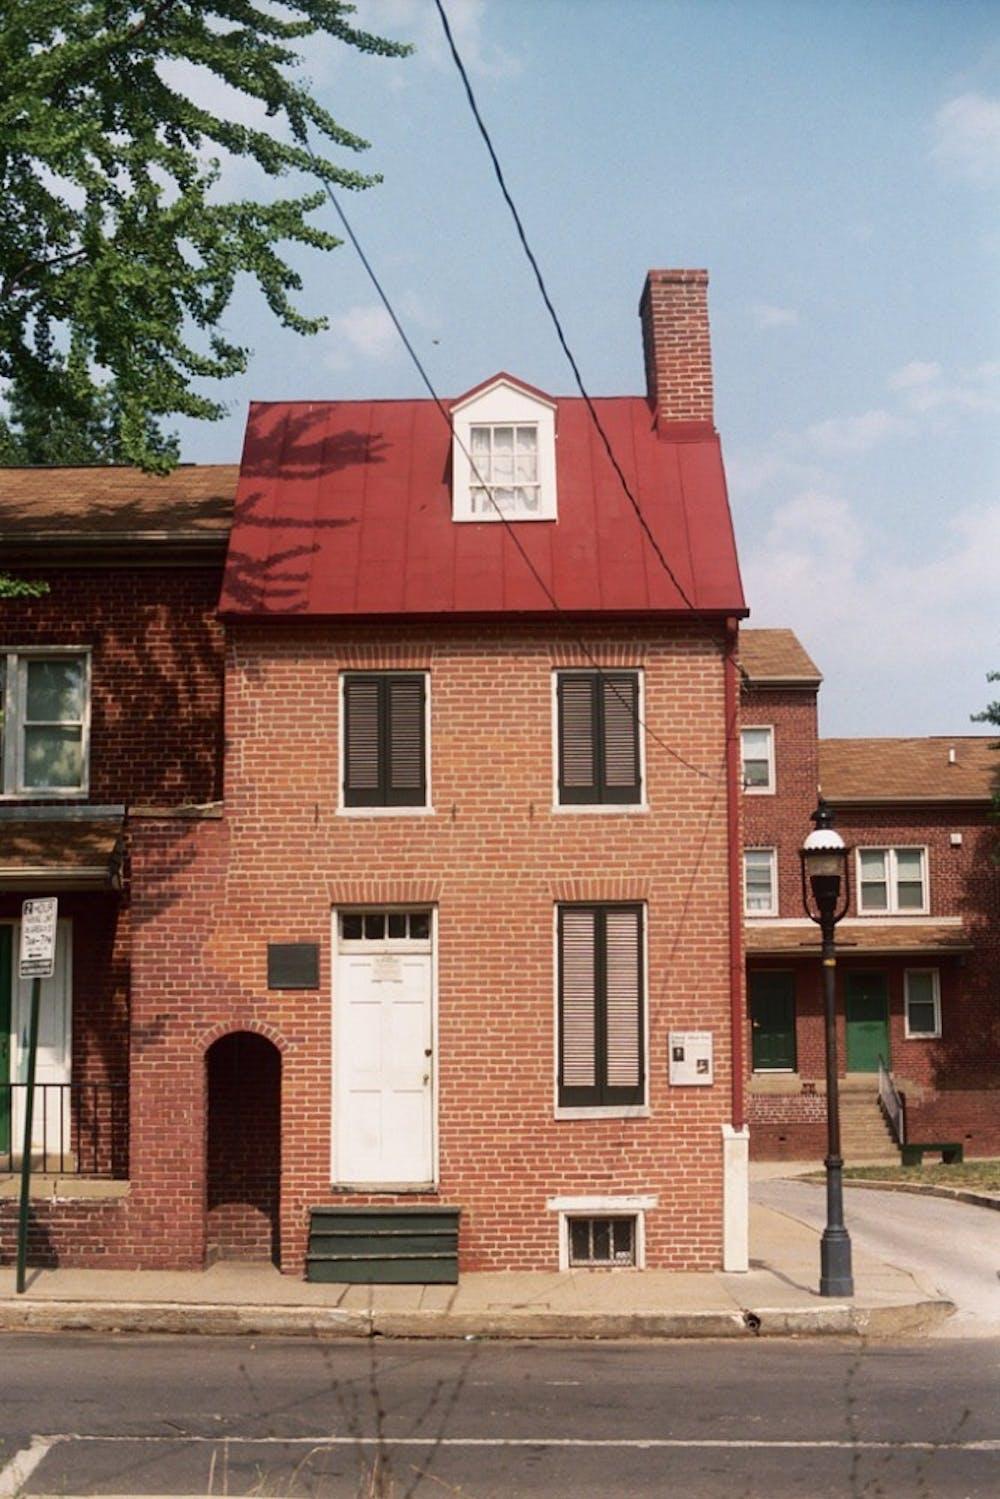 B2_Edgar Allan Poe House